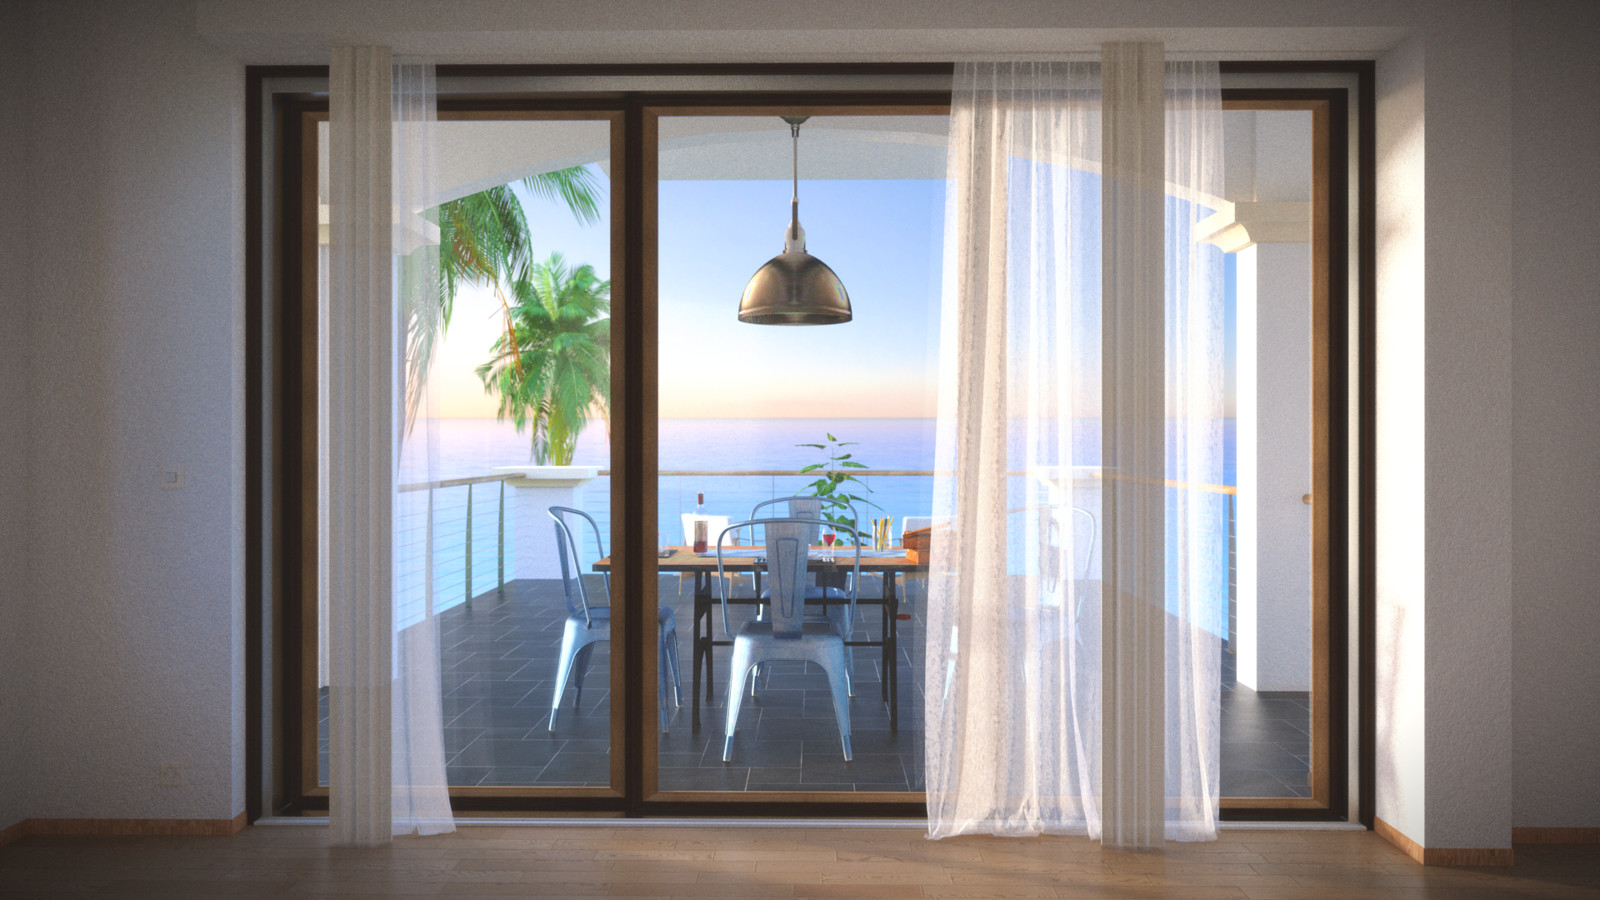 SketchUp + Thea Render  Seagrove Beach House: Scene 30 Int 3rd fl B Rusty 1920 × 1080 Presto MC Bucket